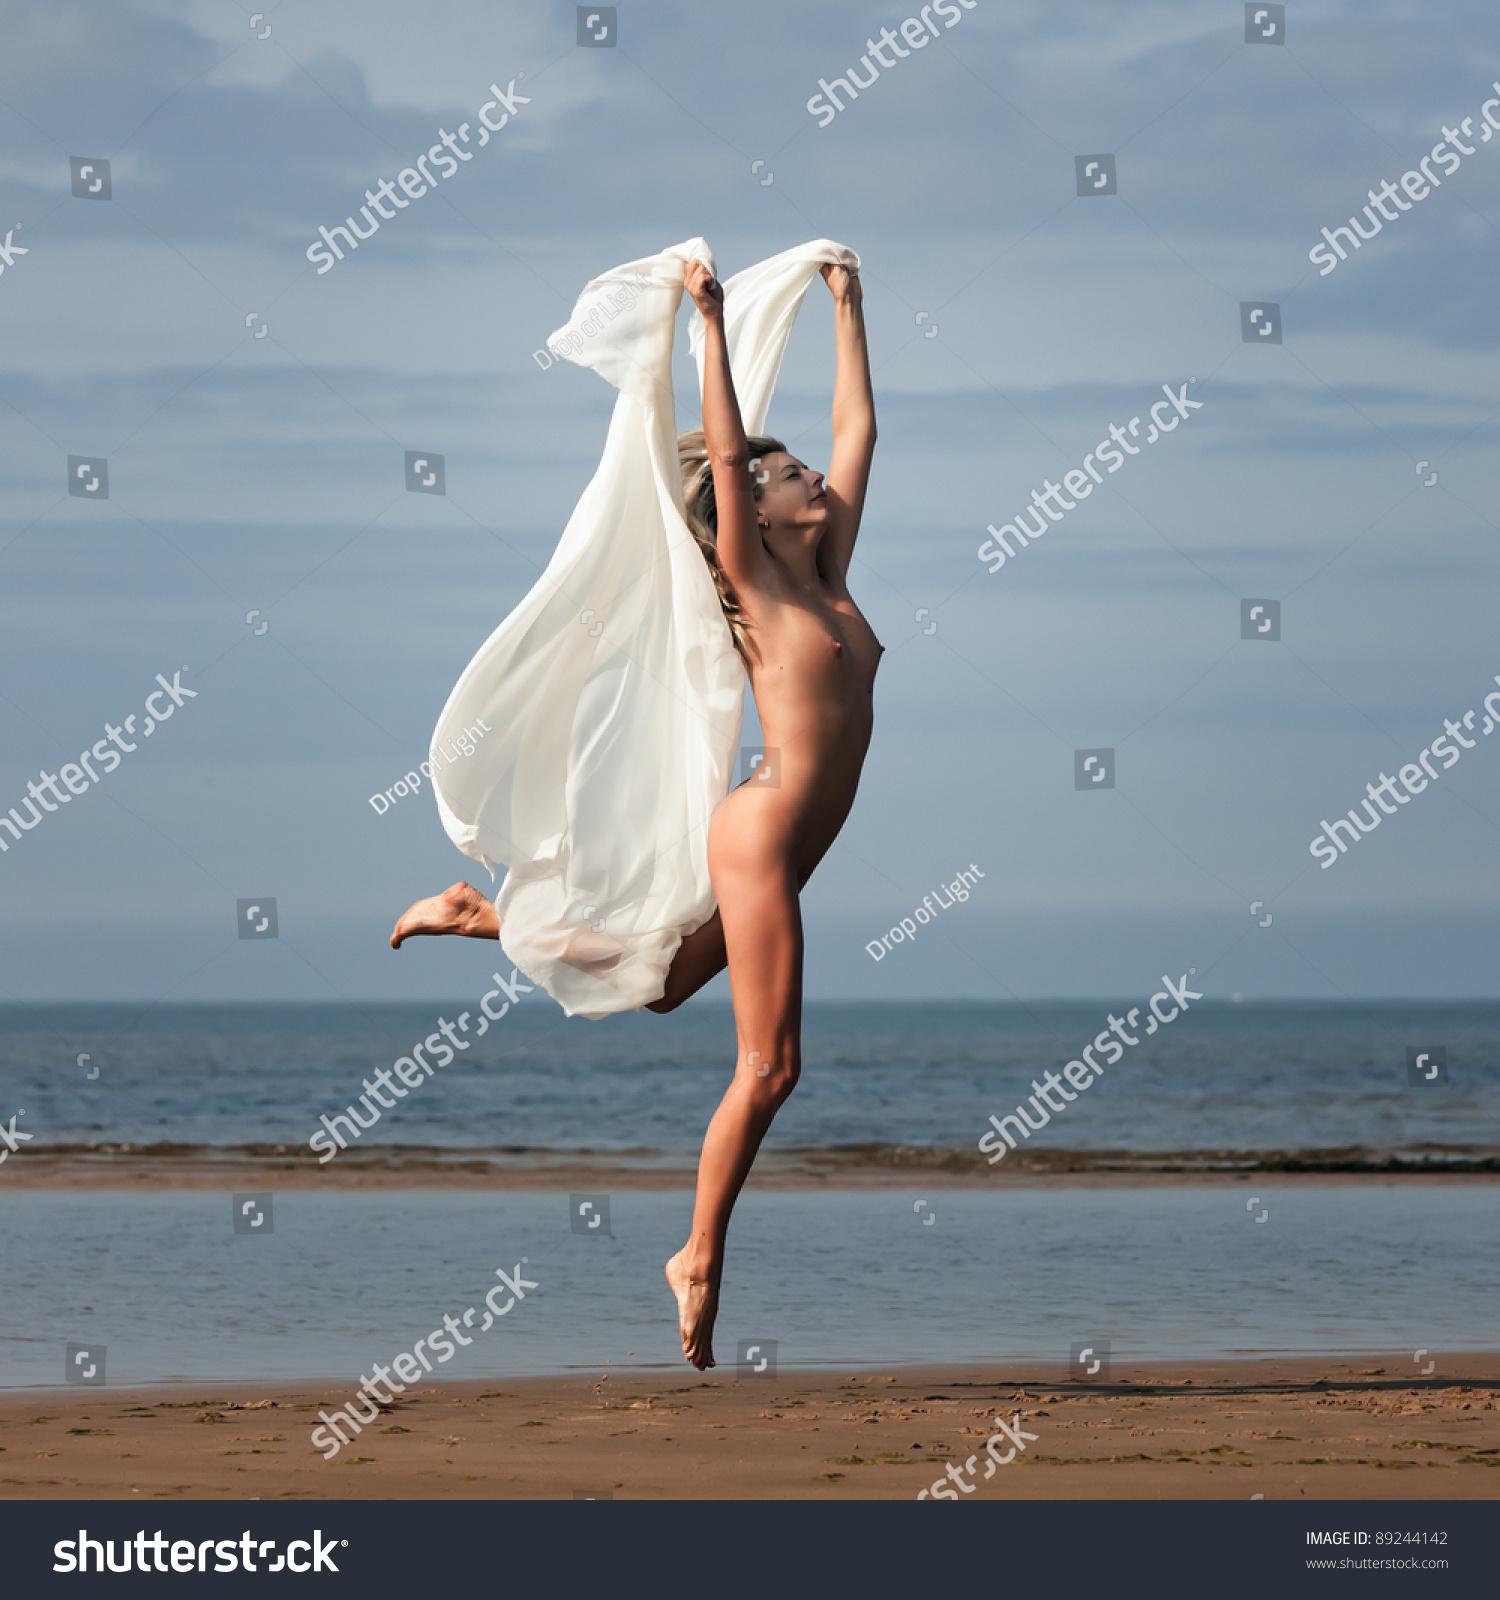 Amusing Nude girl jumping pic